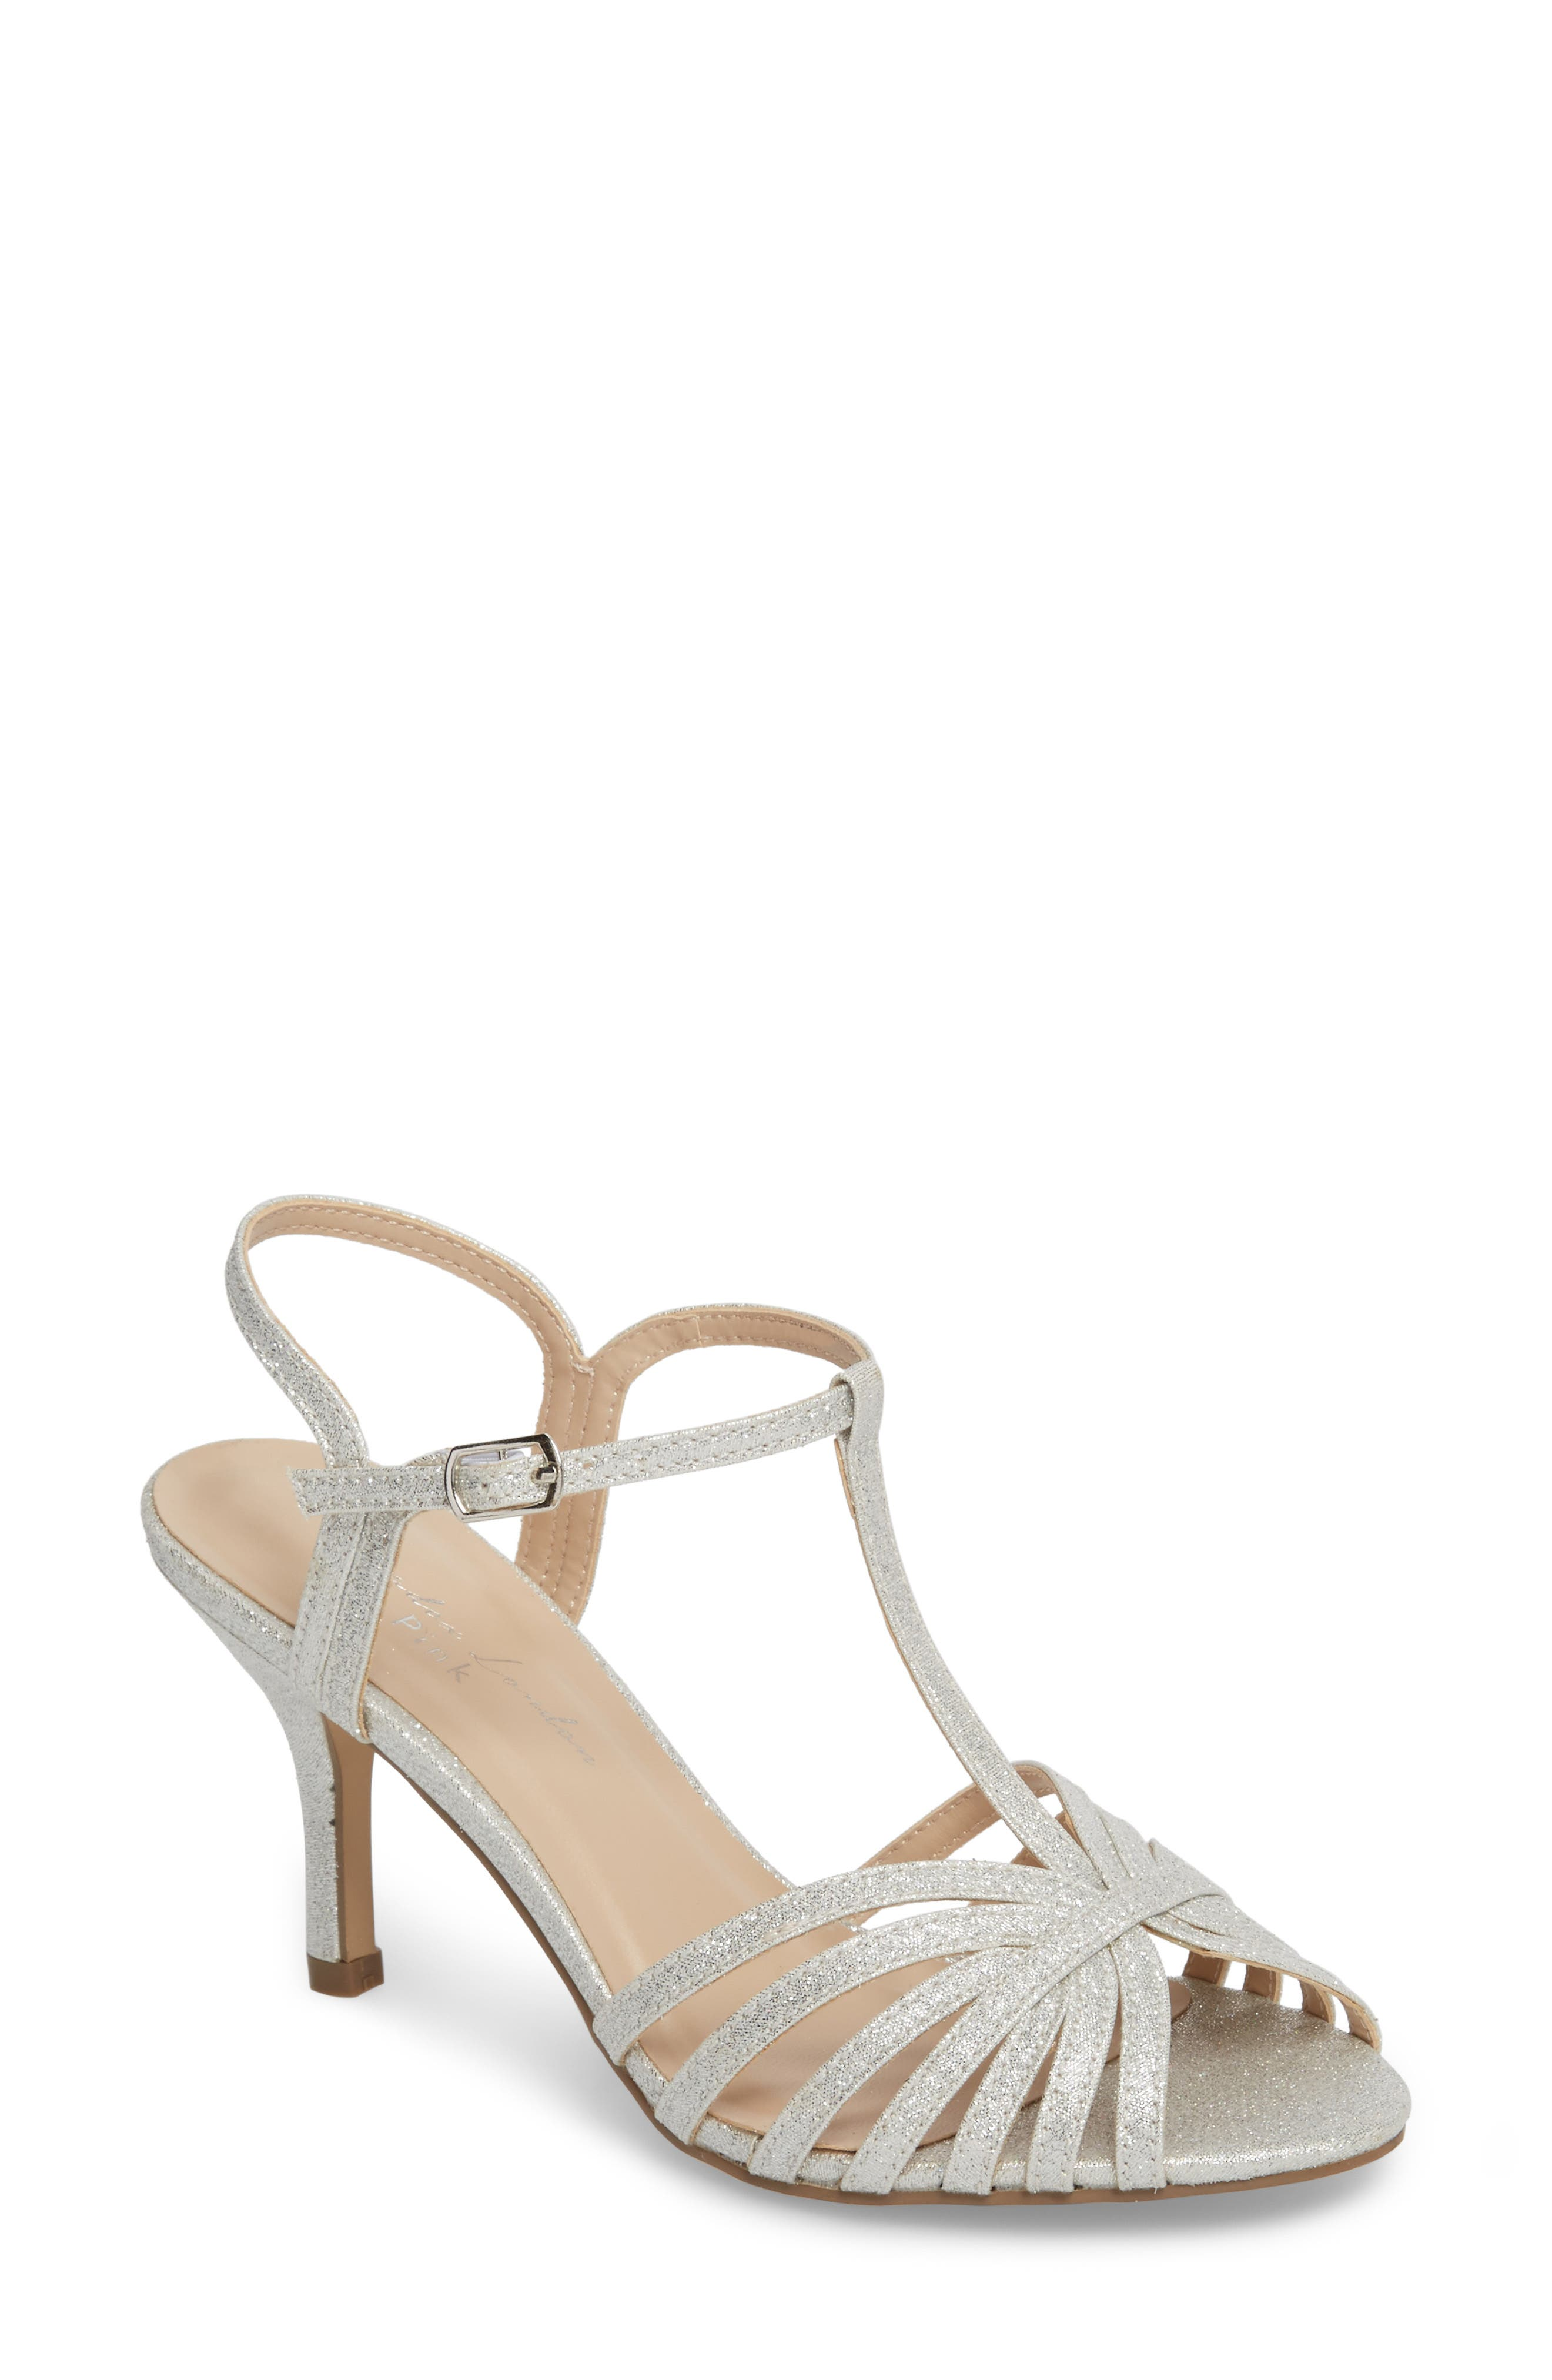 Maggie T-Strap Sandal,                             Main thumbnail 1, color,                             Silver Glitter